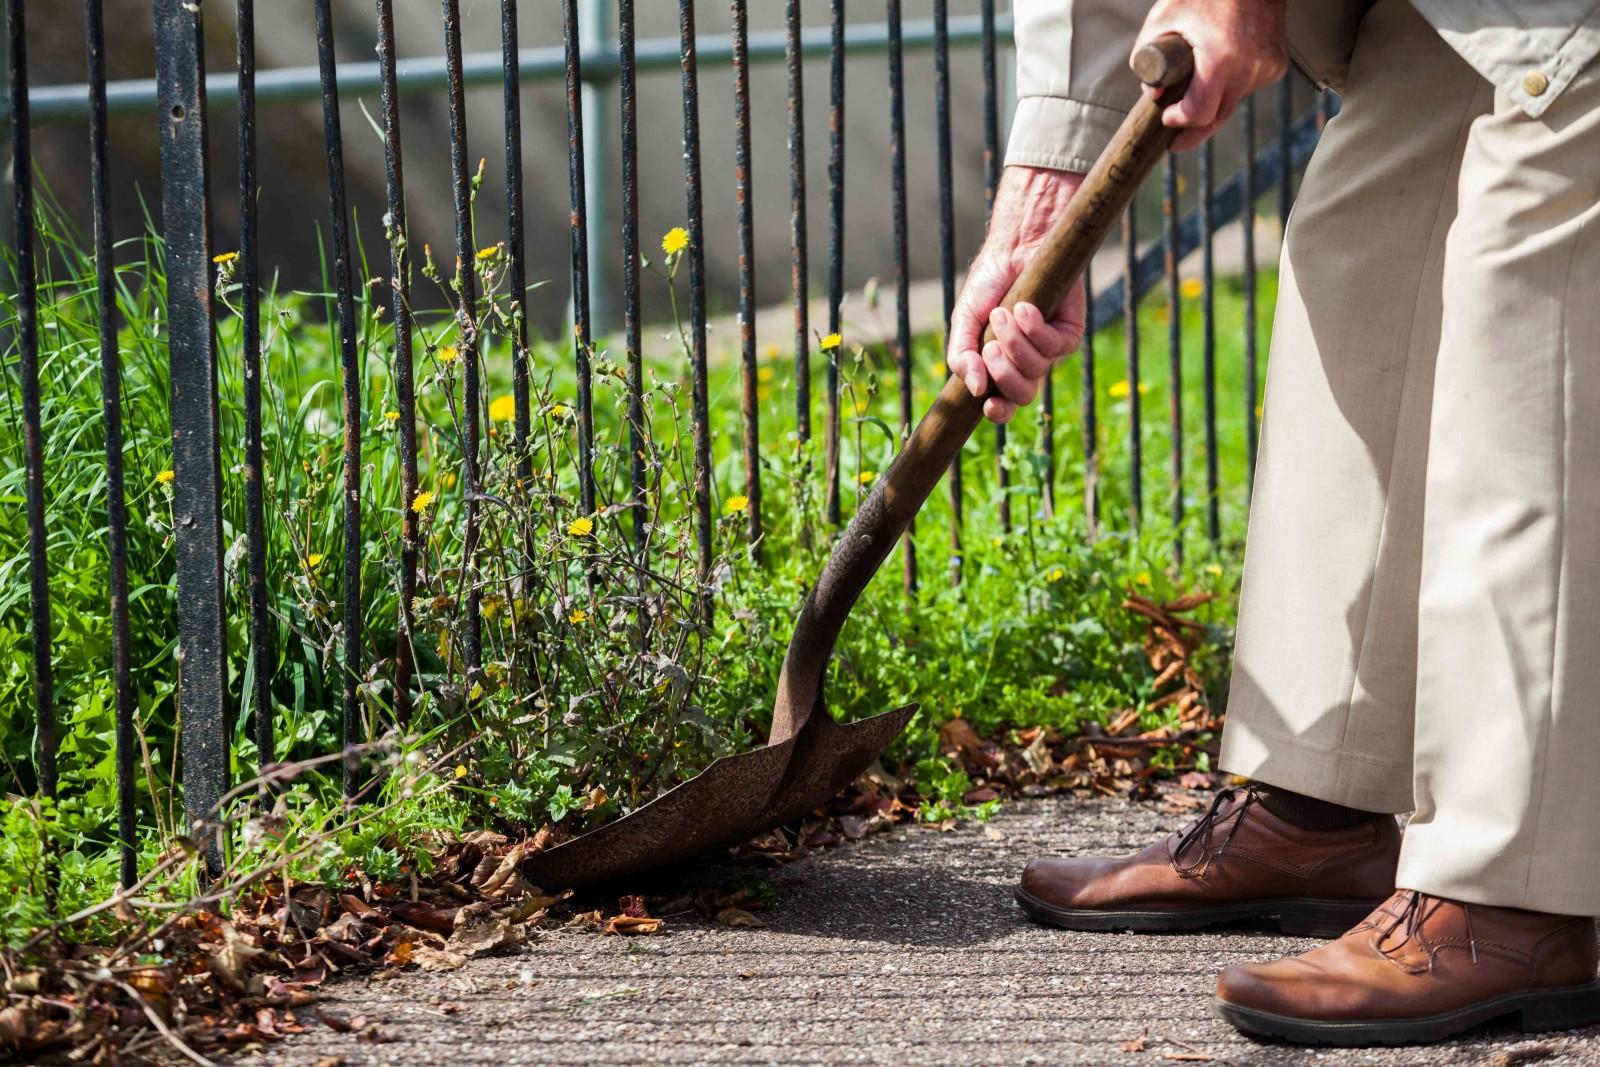 'Spaderman' finally reveals himself after spending years ridding hometown of pesky weeds